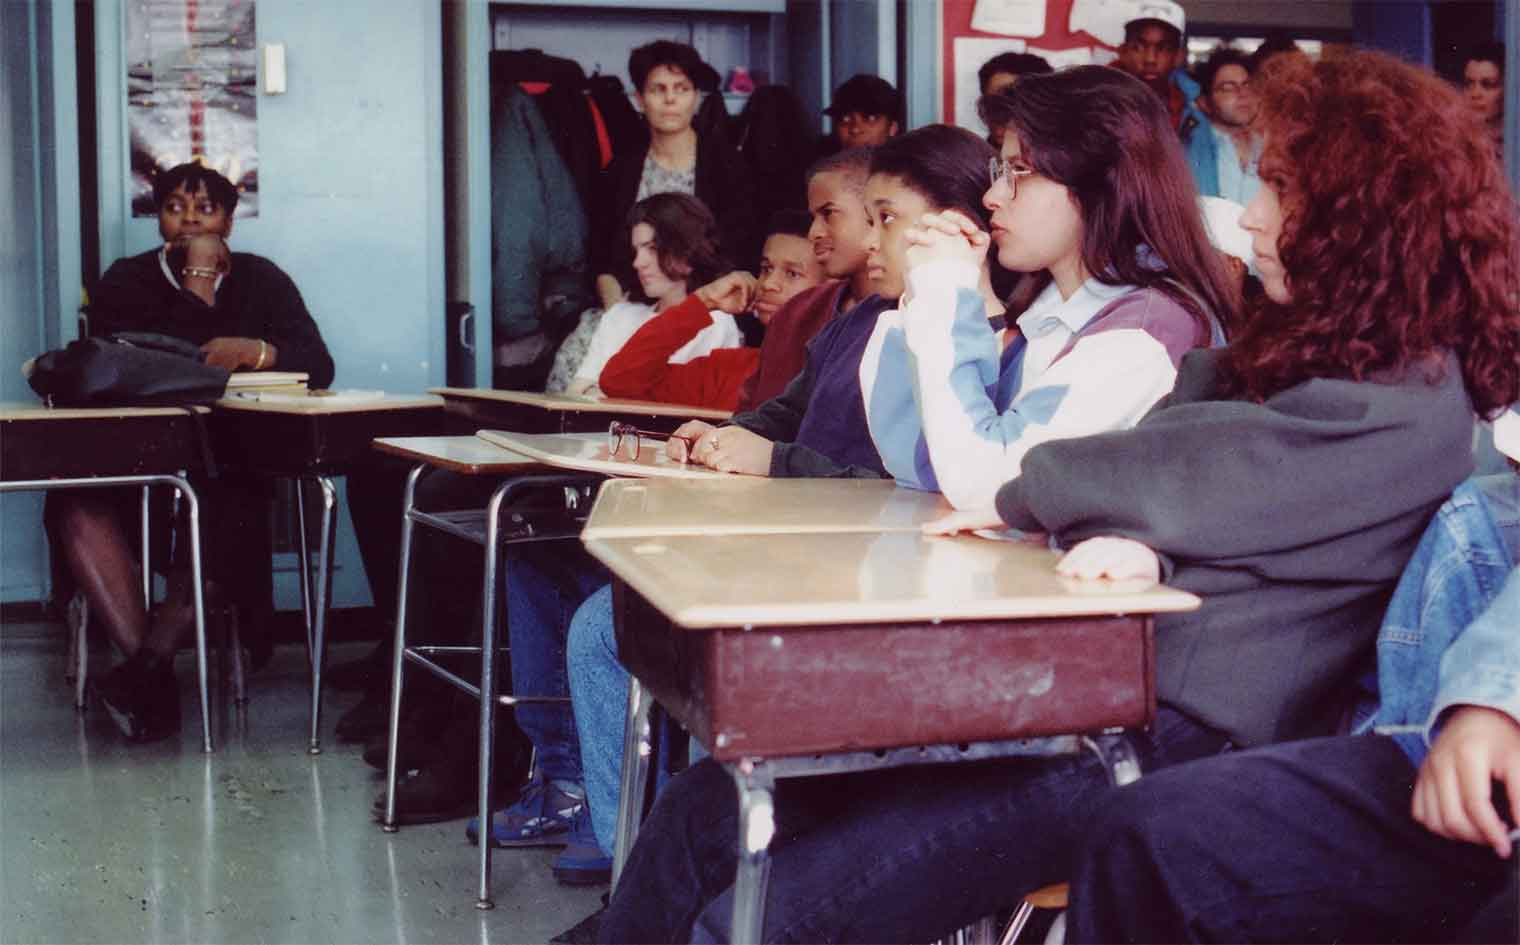 HIGH SCHOOL II